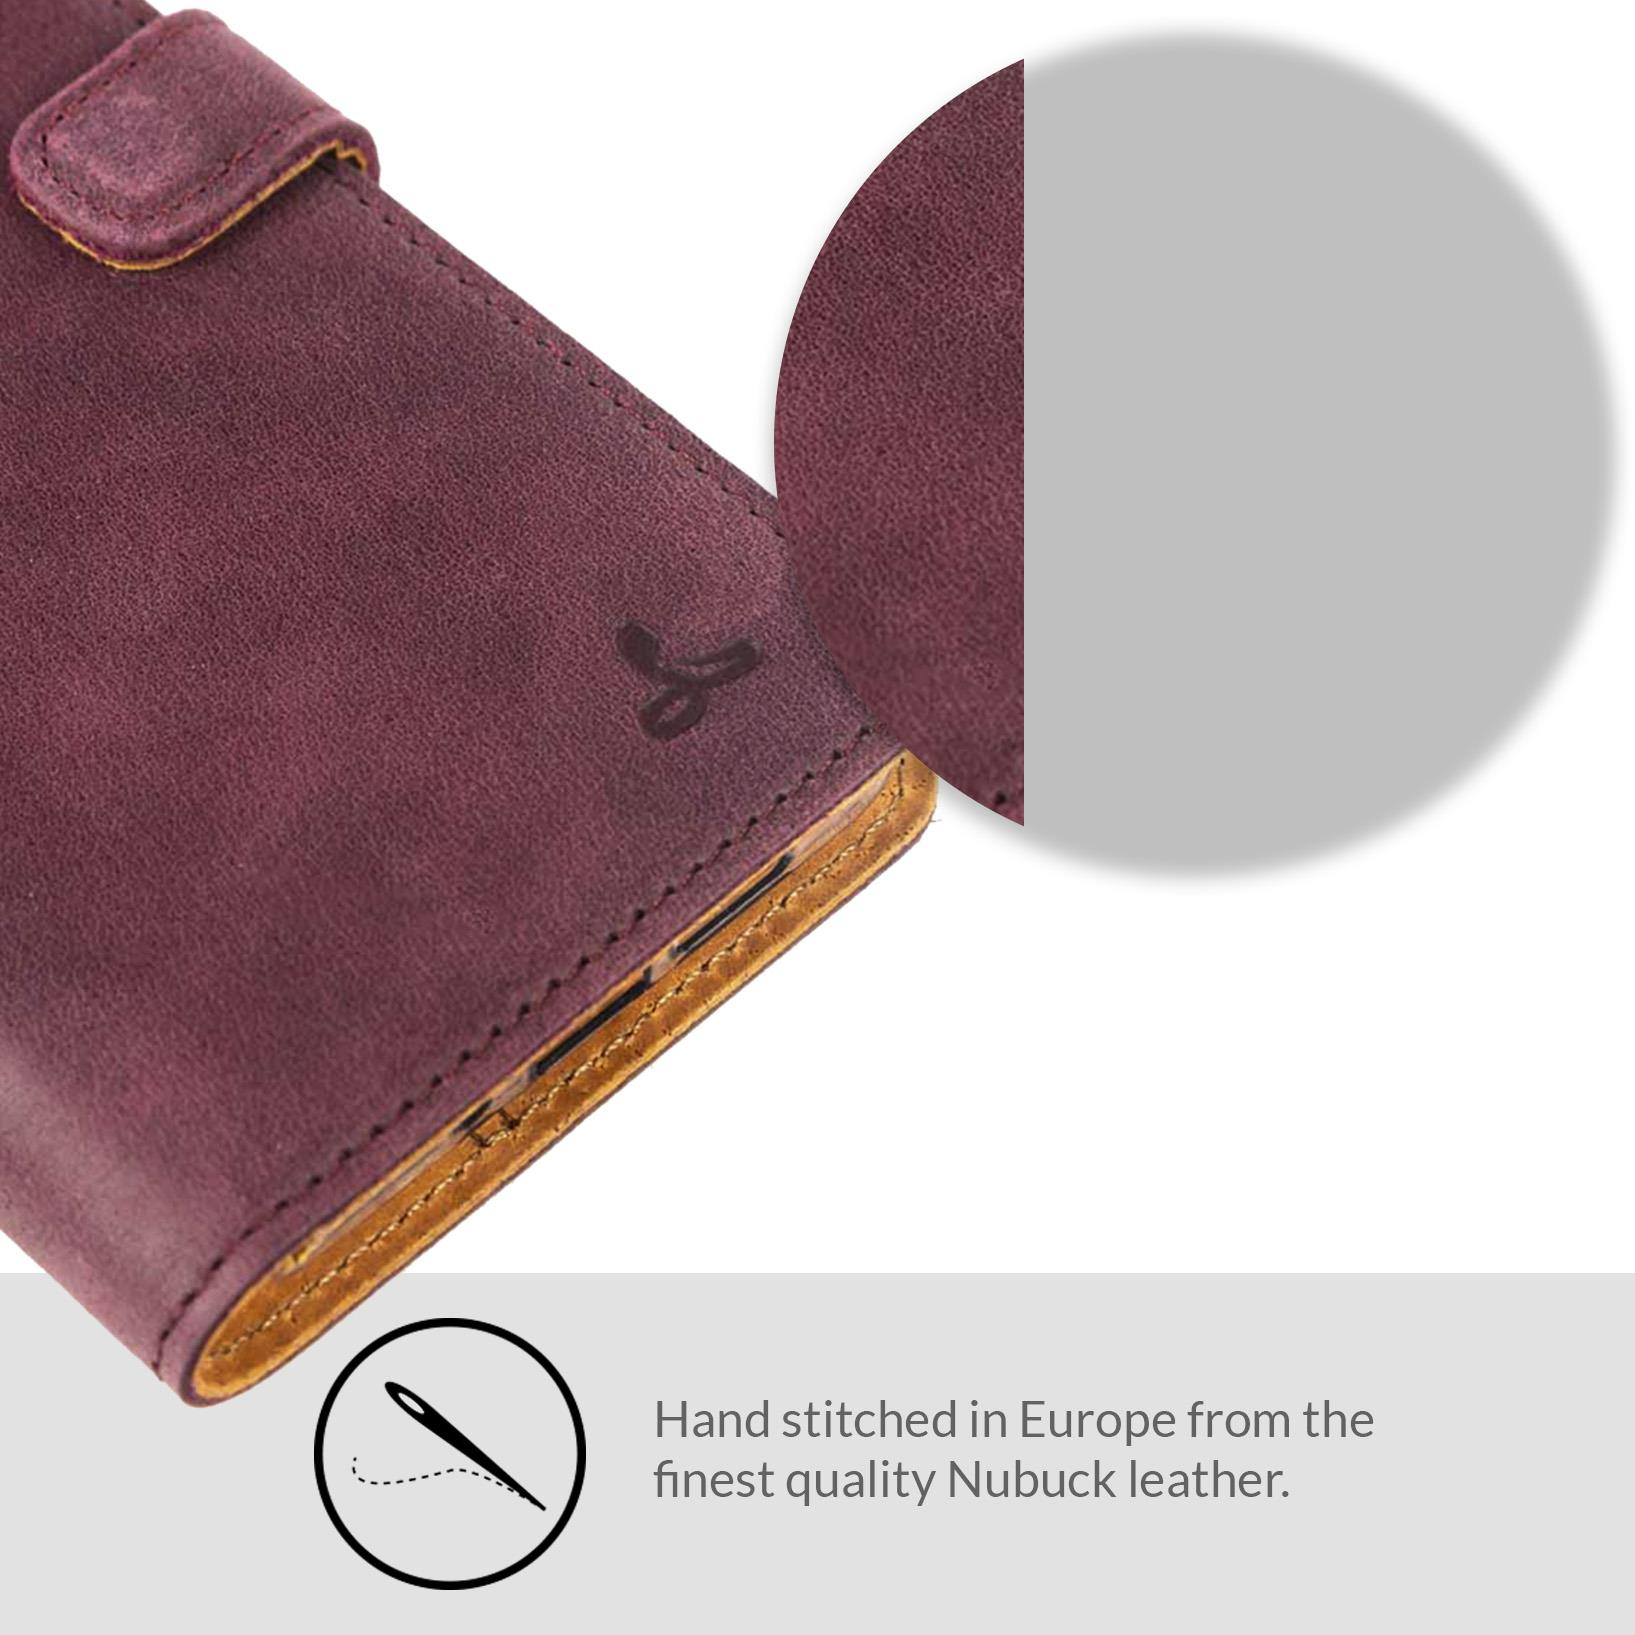 Snakehive-Huawei-P30-Pro-Premium-Genuine-Leather-Wallet-Case-w-Card-Slots thumbnail 17